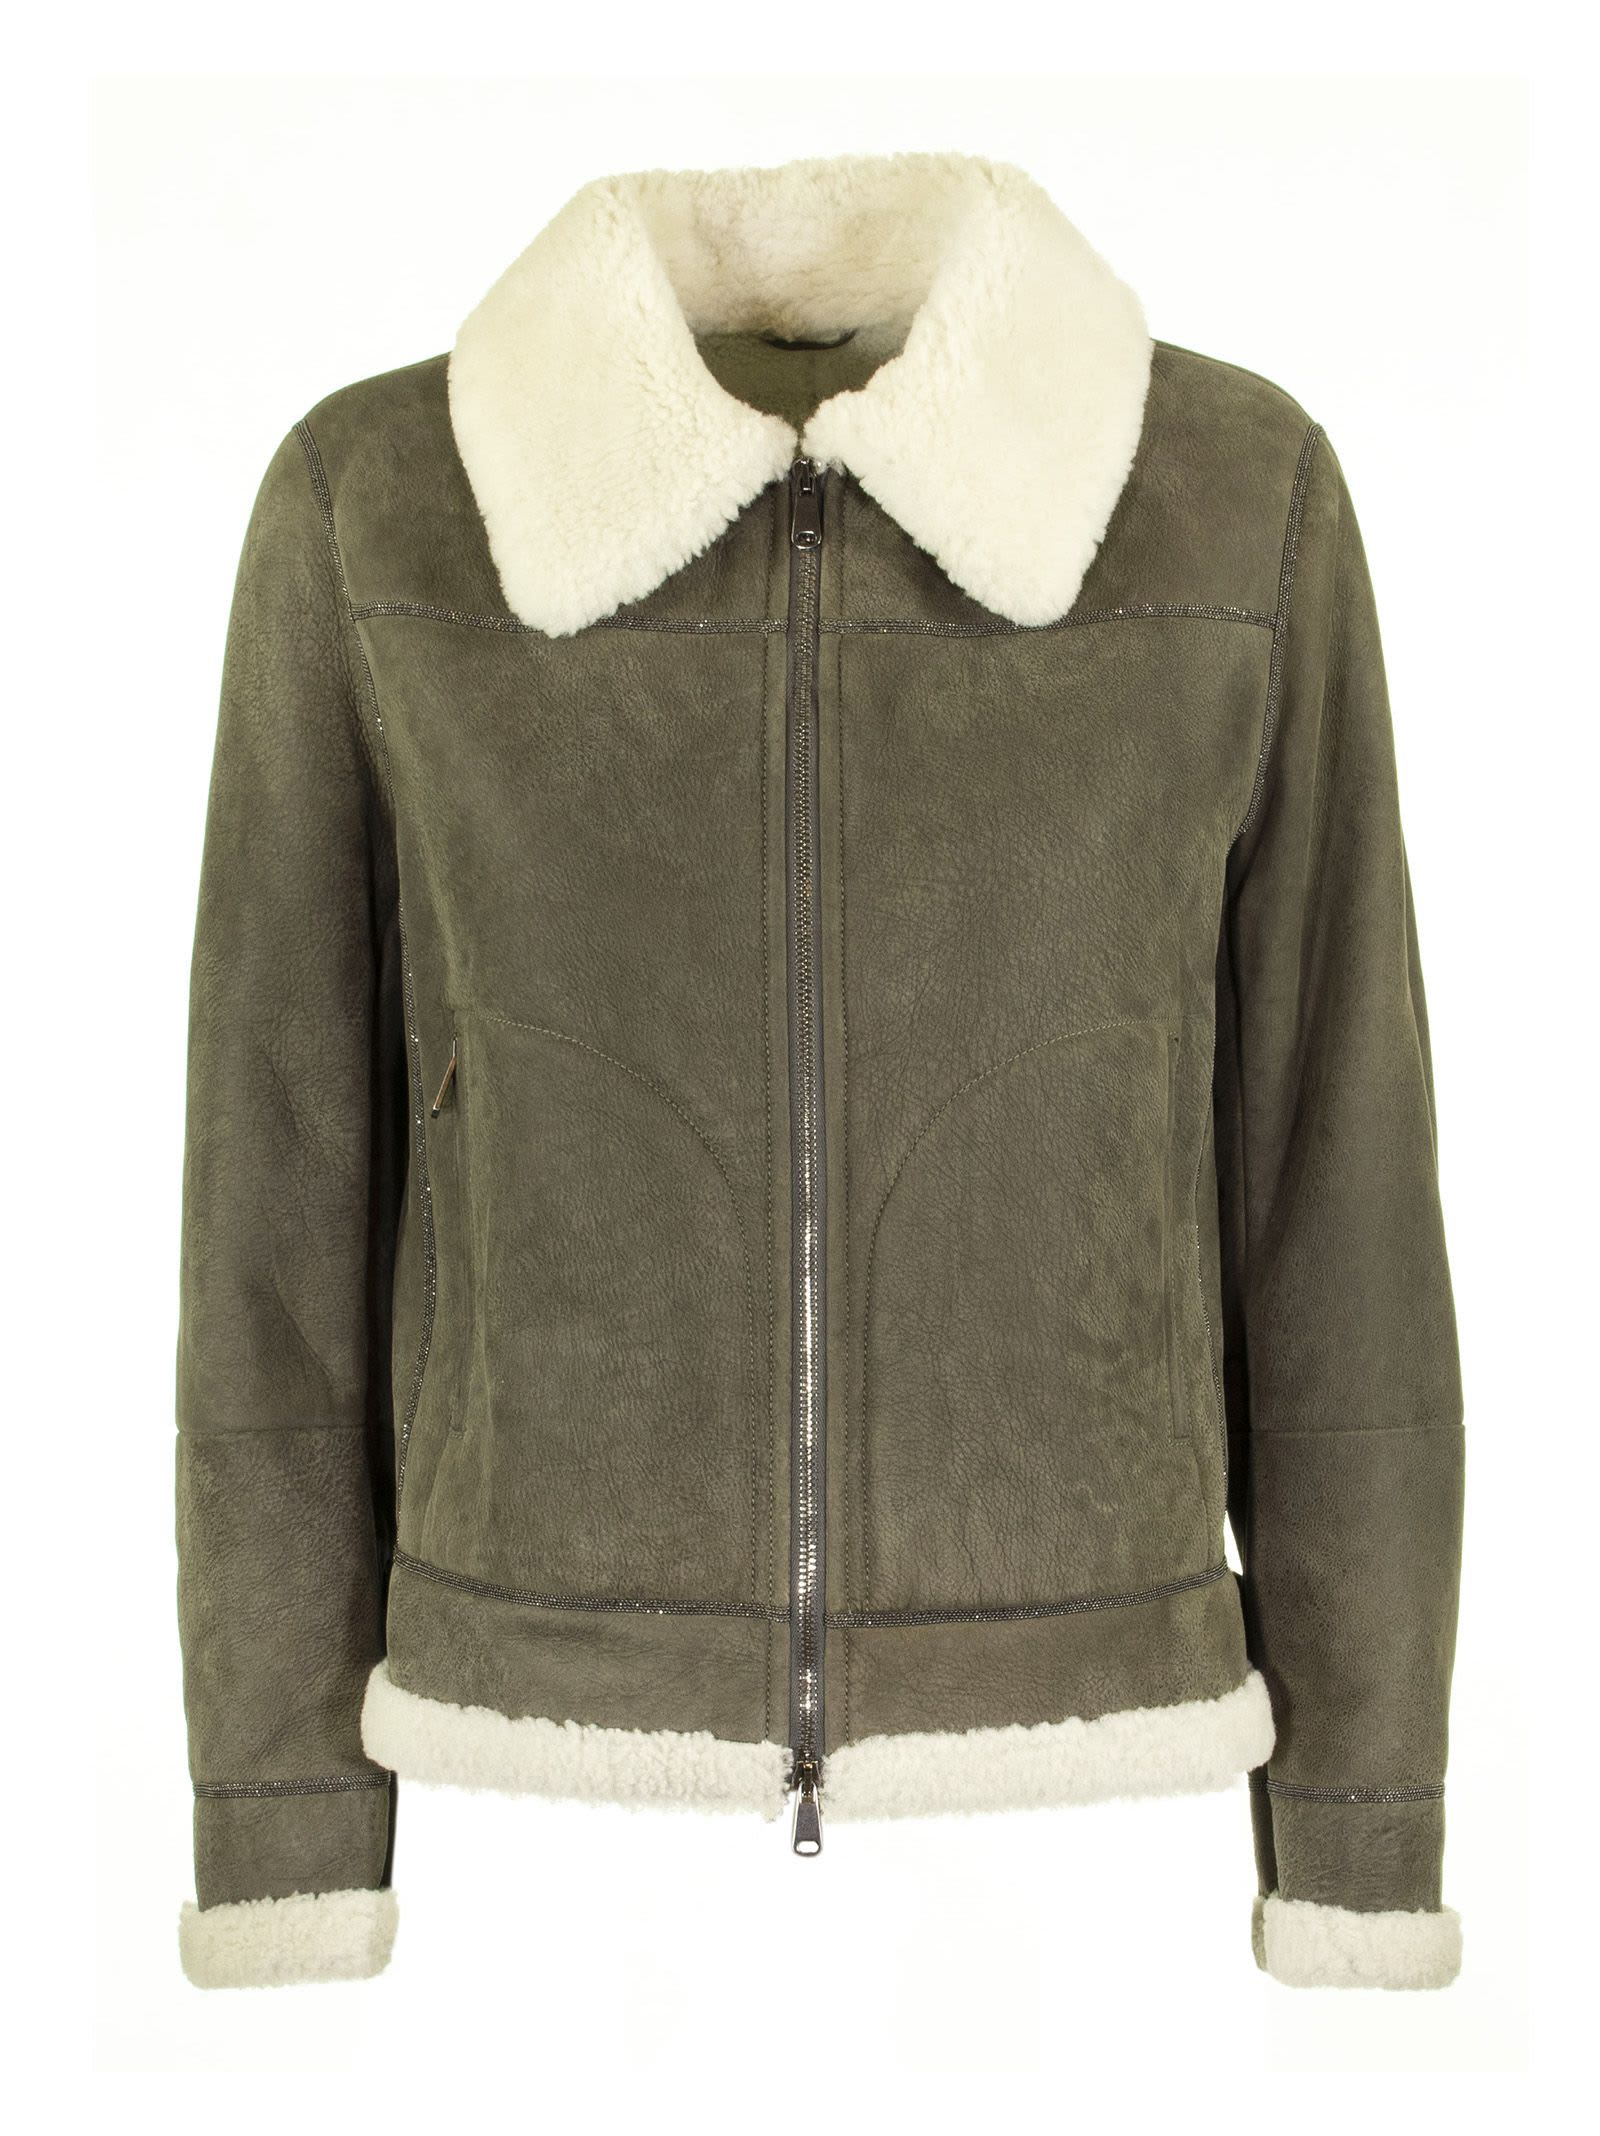 Brunello Cucinelli Matte Aviator Shearling Outerwear Jacket With Monili